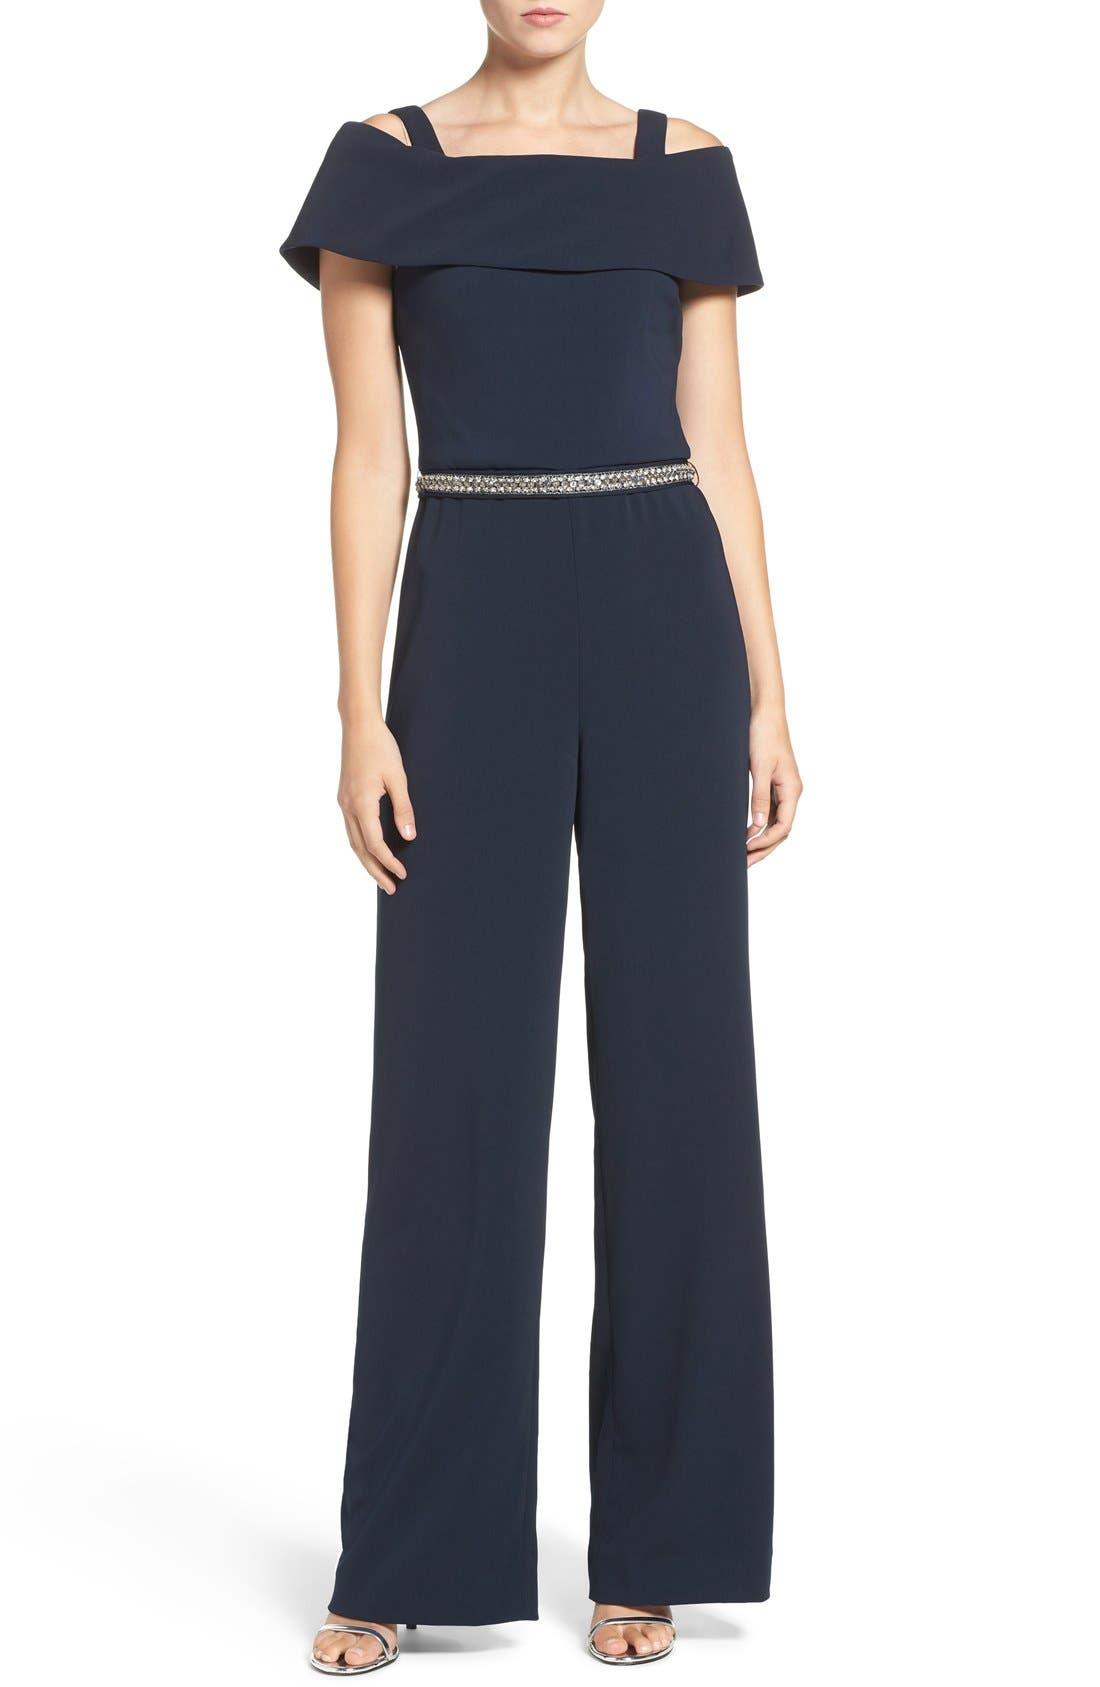 Main Image - Badgley Mischka Embellished Stretch Jumpsuit